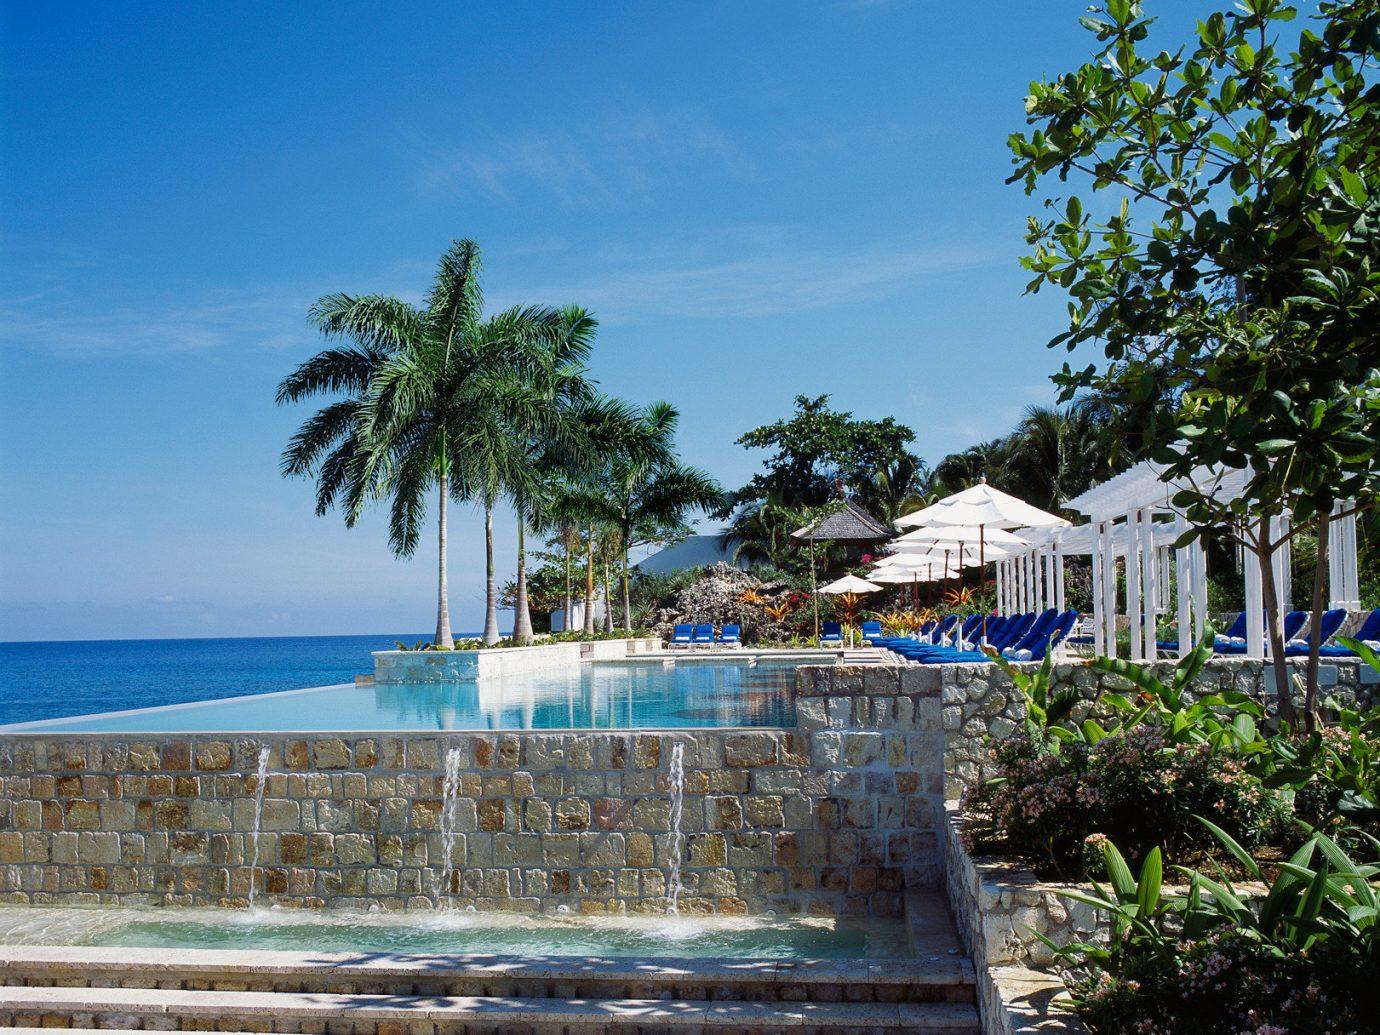 Hotels tree outdoor sky Beach wooden vacation Resort Sea park Ocean arecales estate walkway tropics Coast caribbean Garden stone